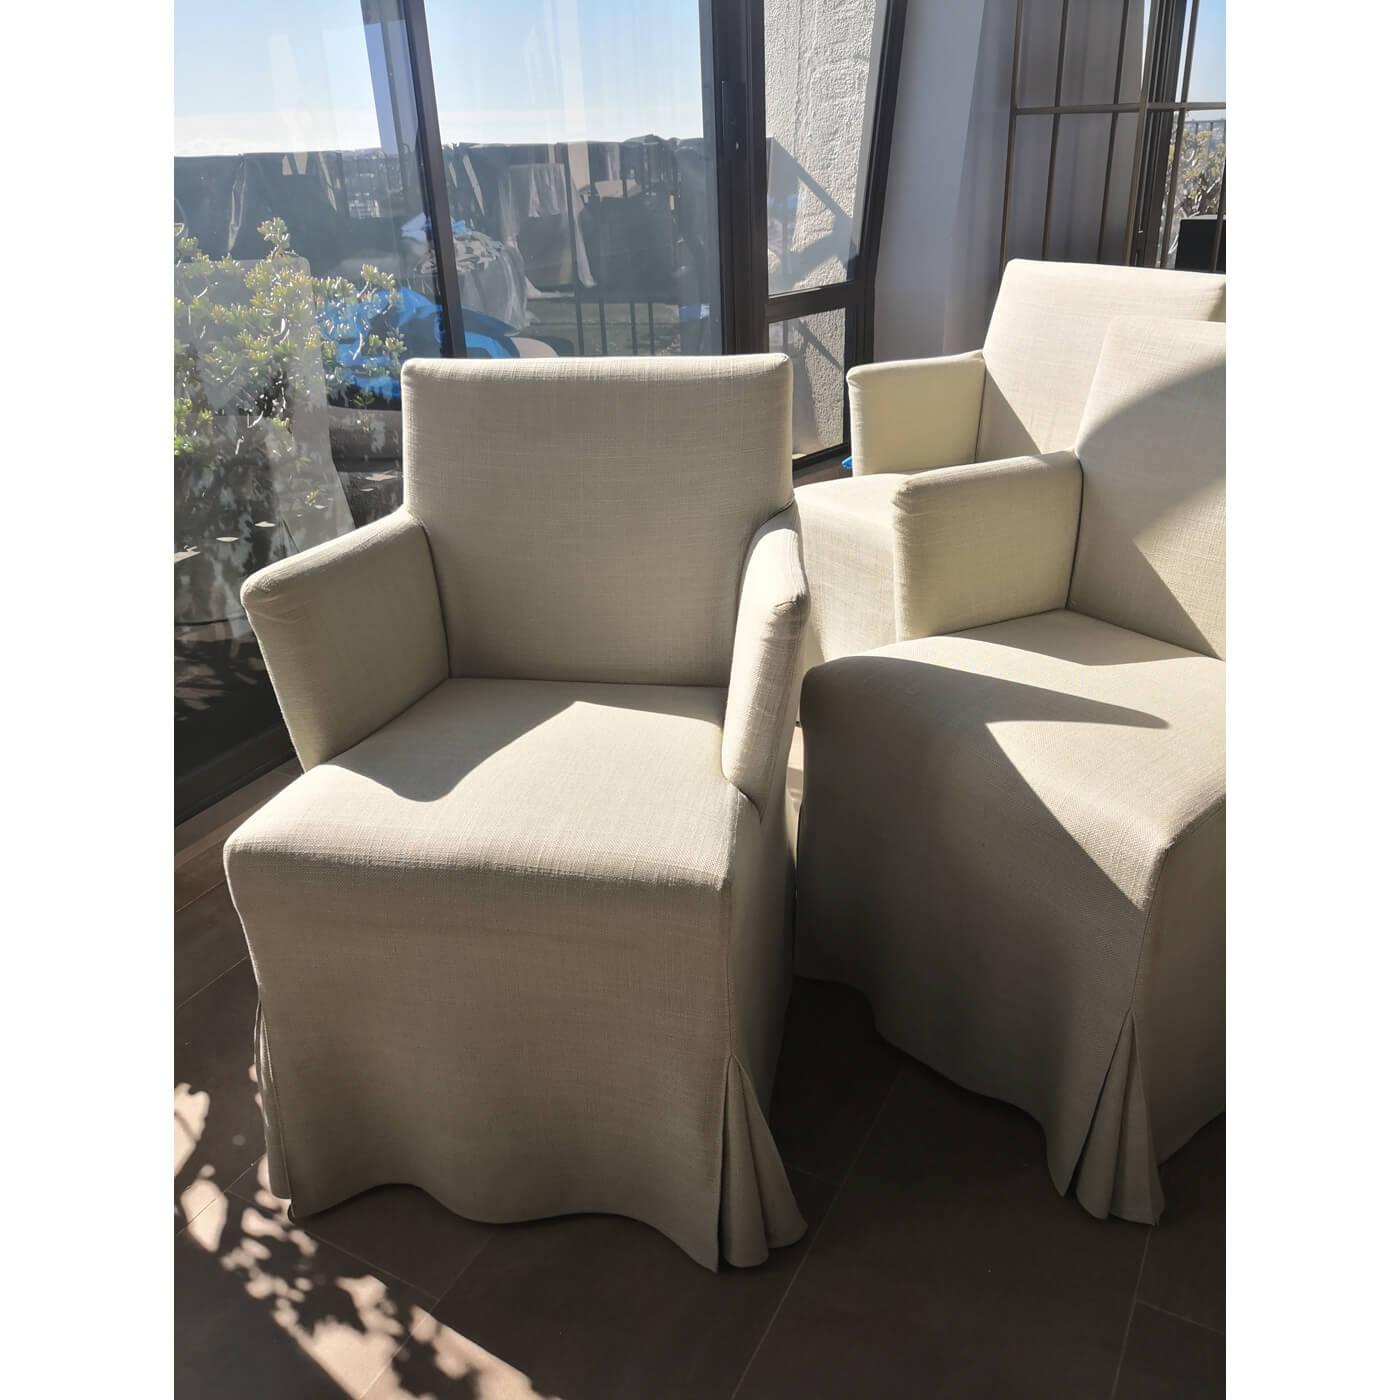 B&B Italia Maxalto Peplo dining chairs